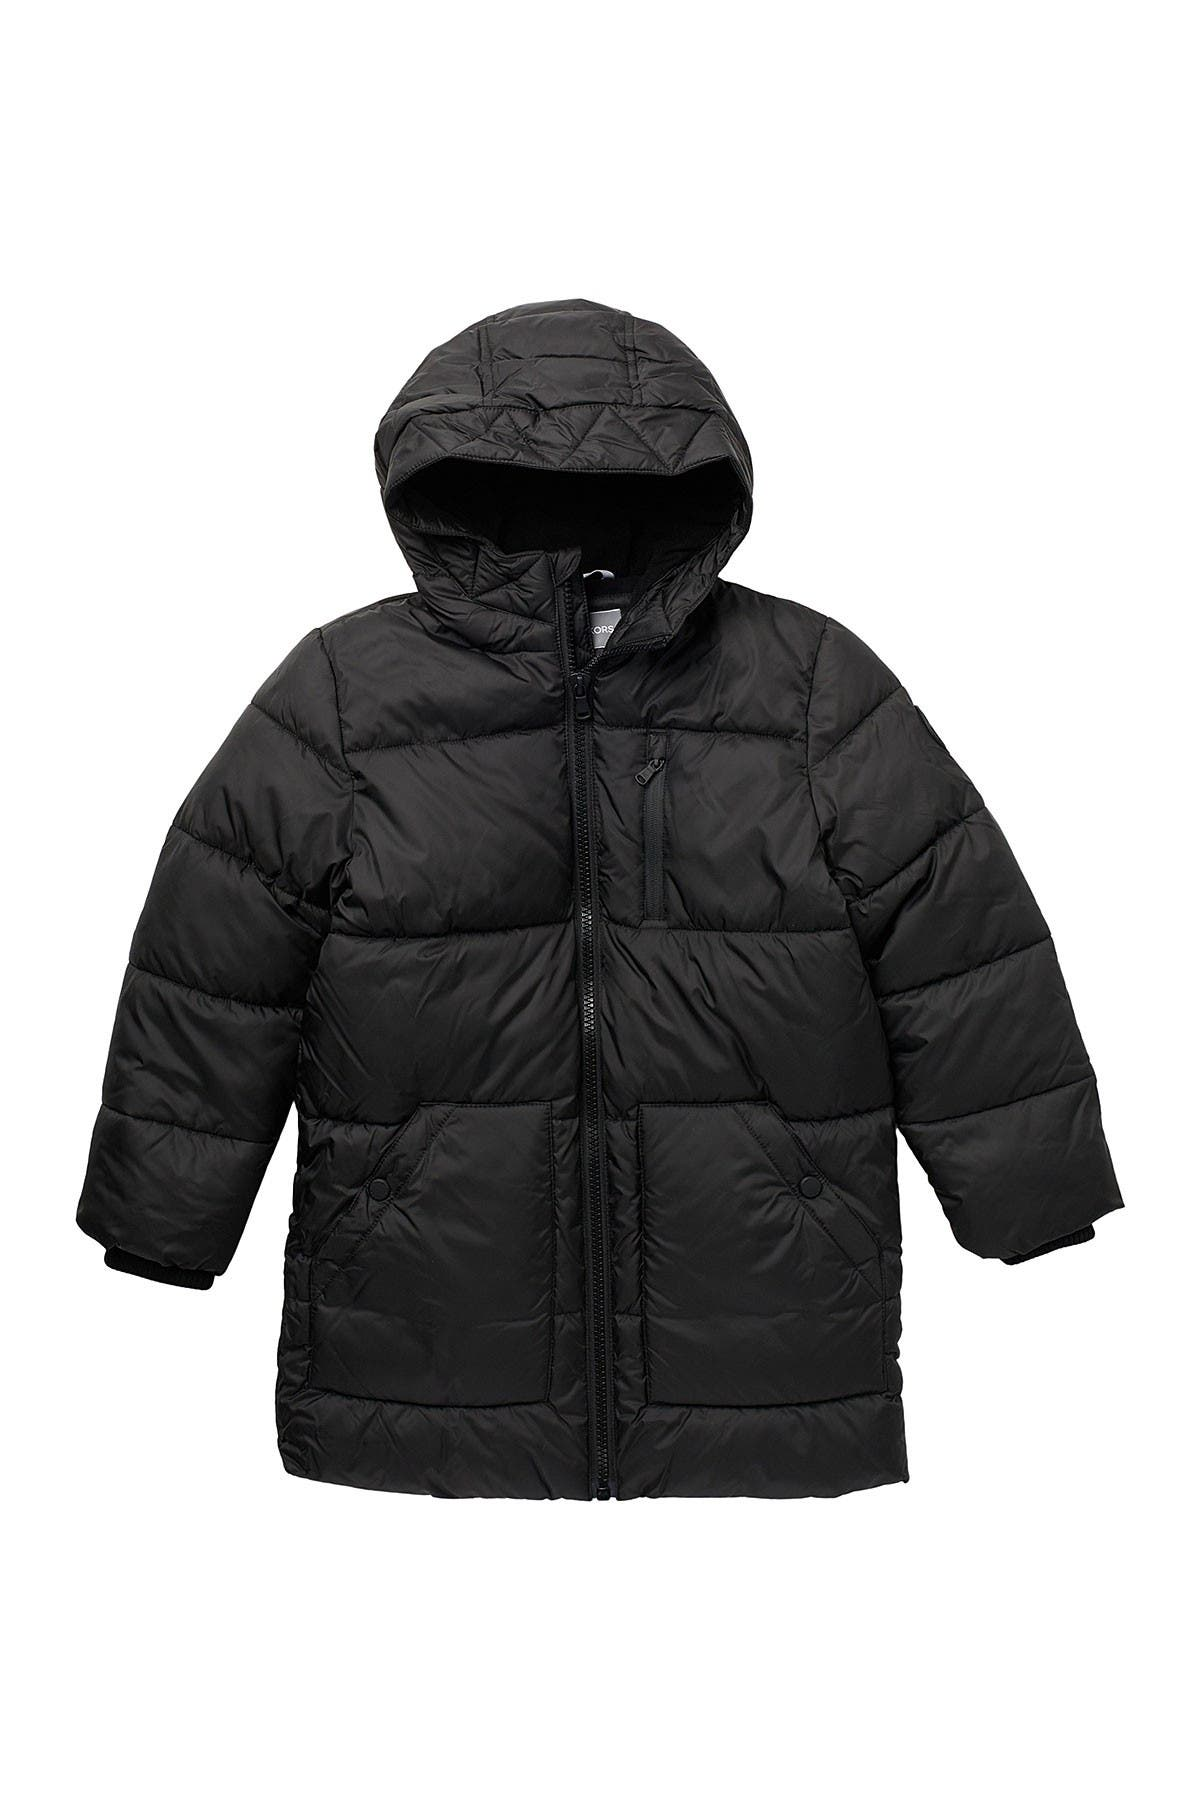 Image of Michael Kors Stadium Puffer Jacket